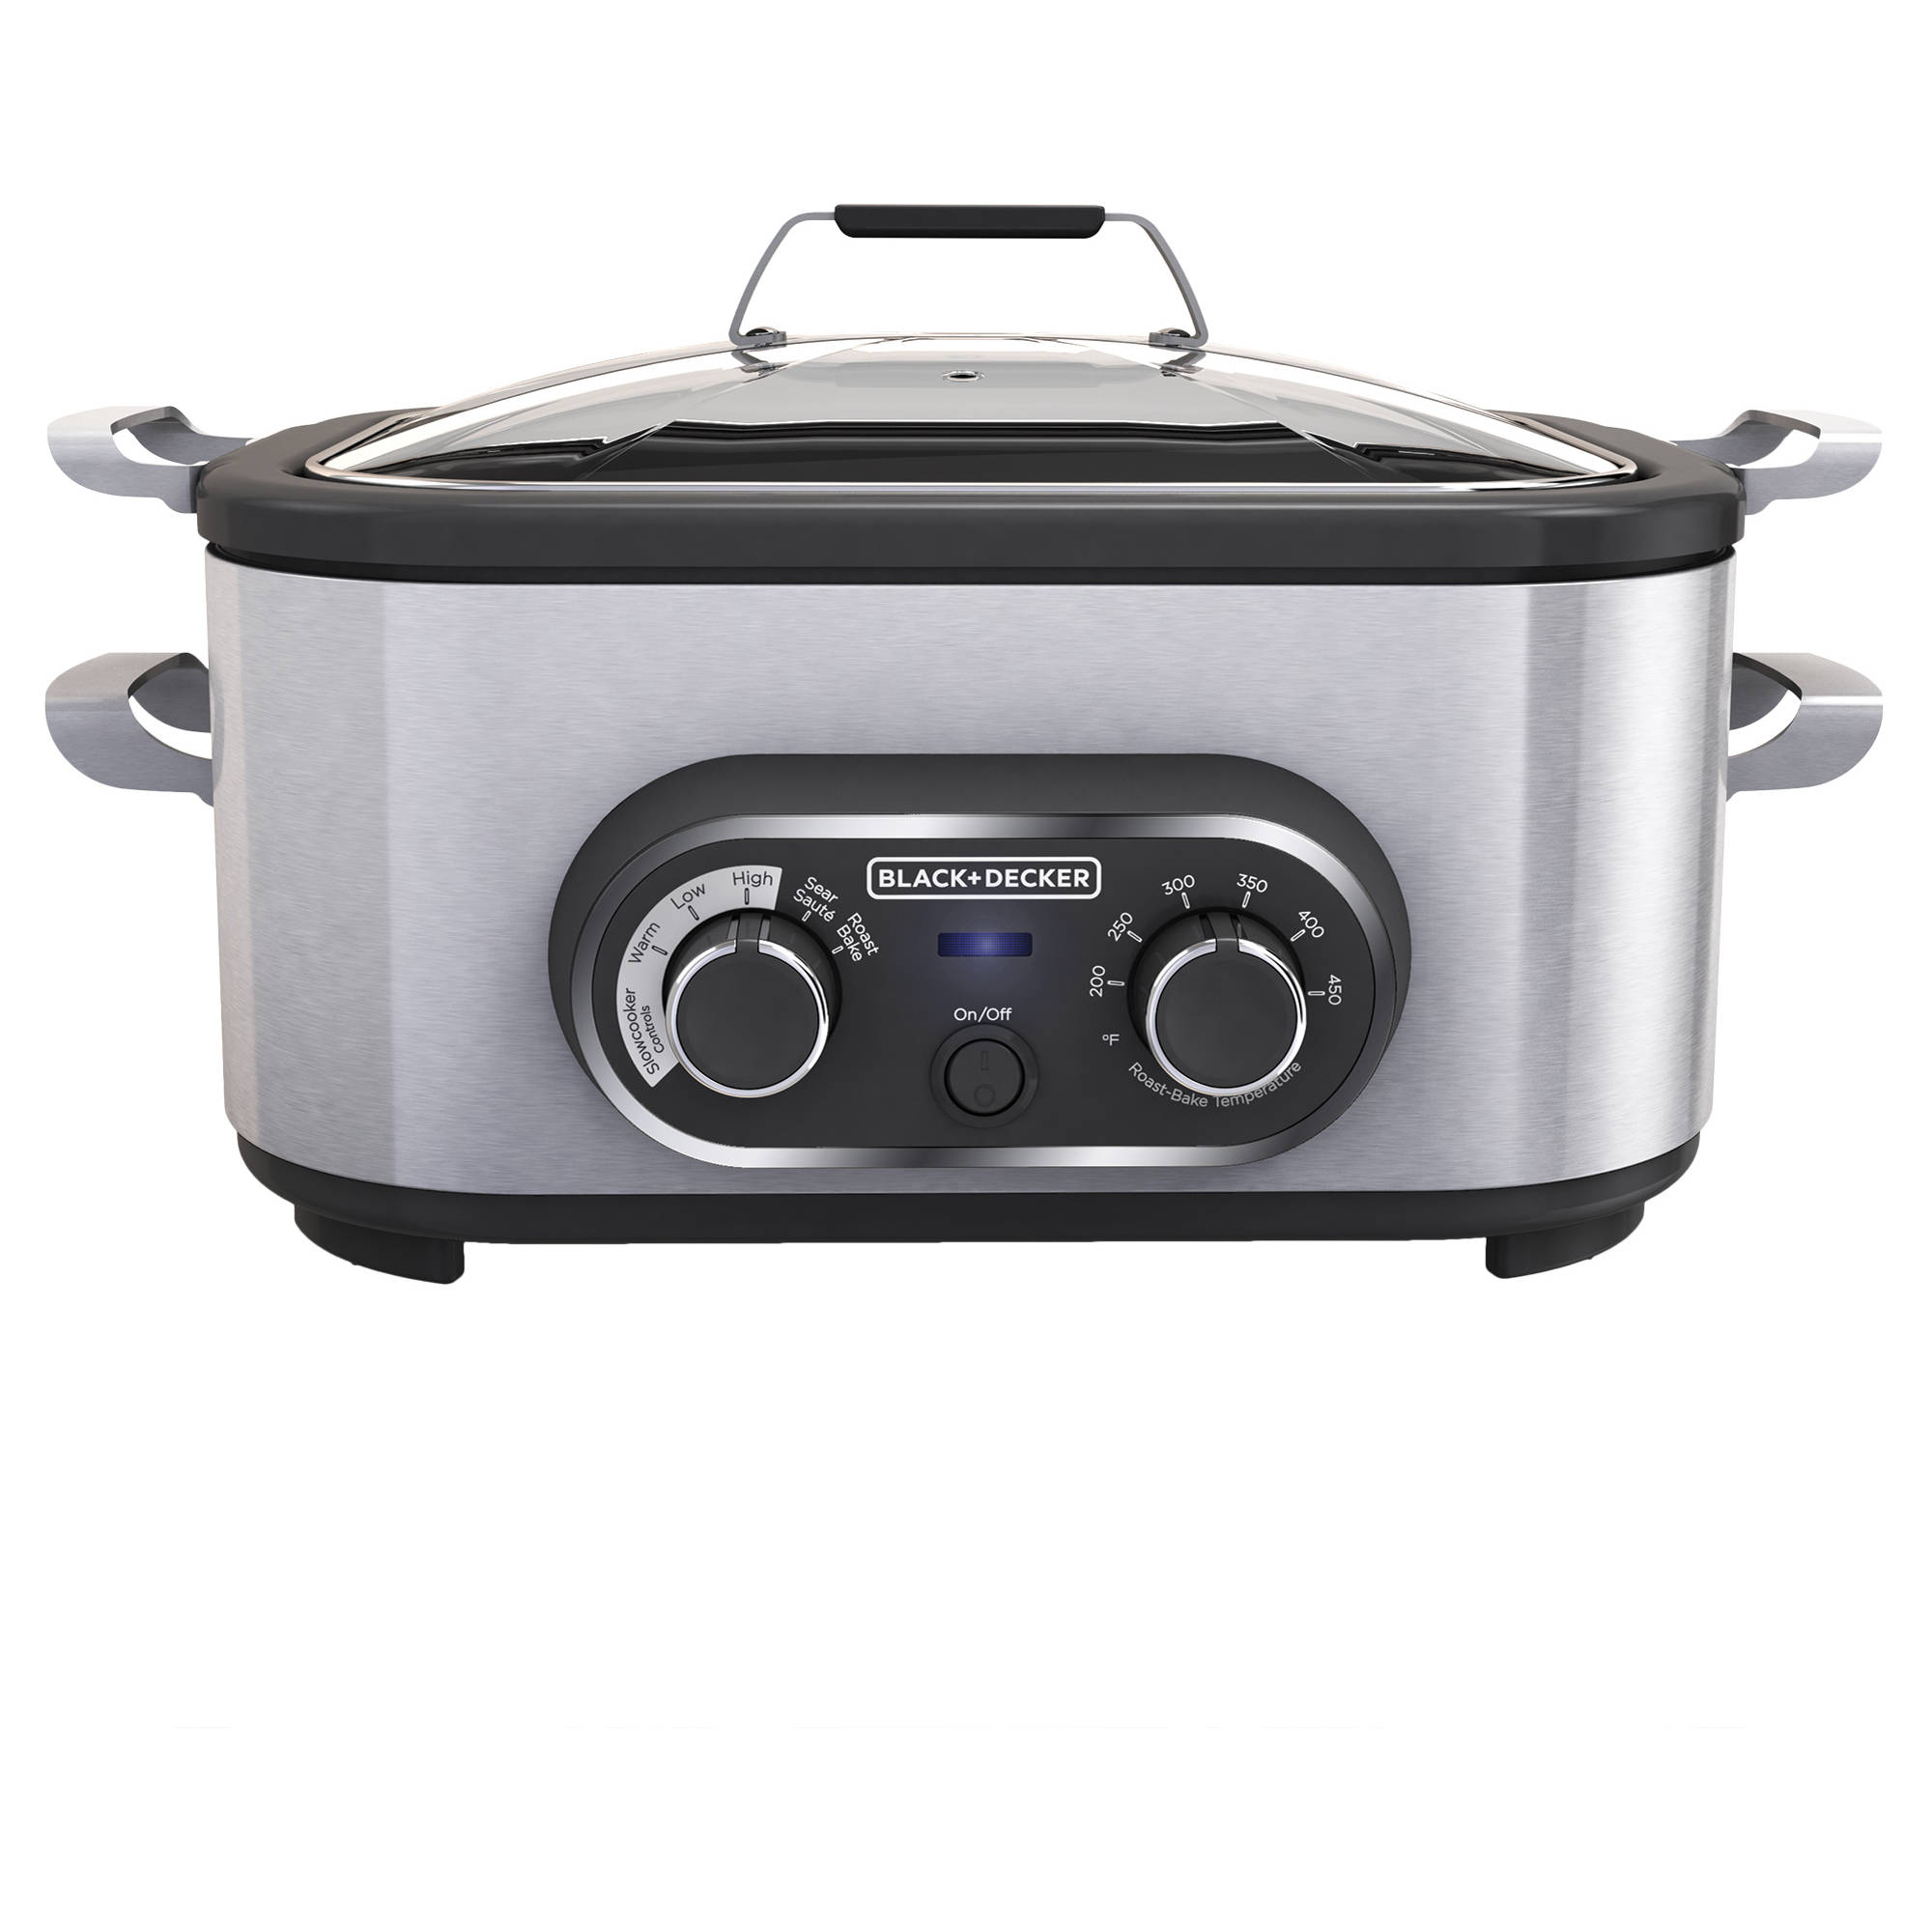 BLACK+DECKER 6-Quart Multi Function Slow Cooker, MC1100S by Spectrum Brands